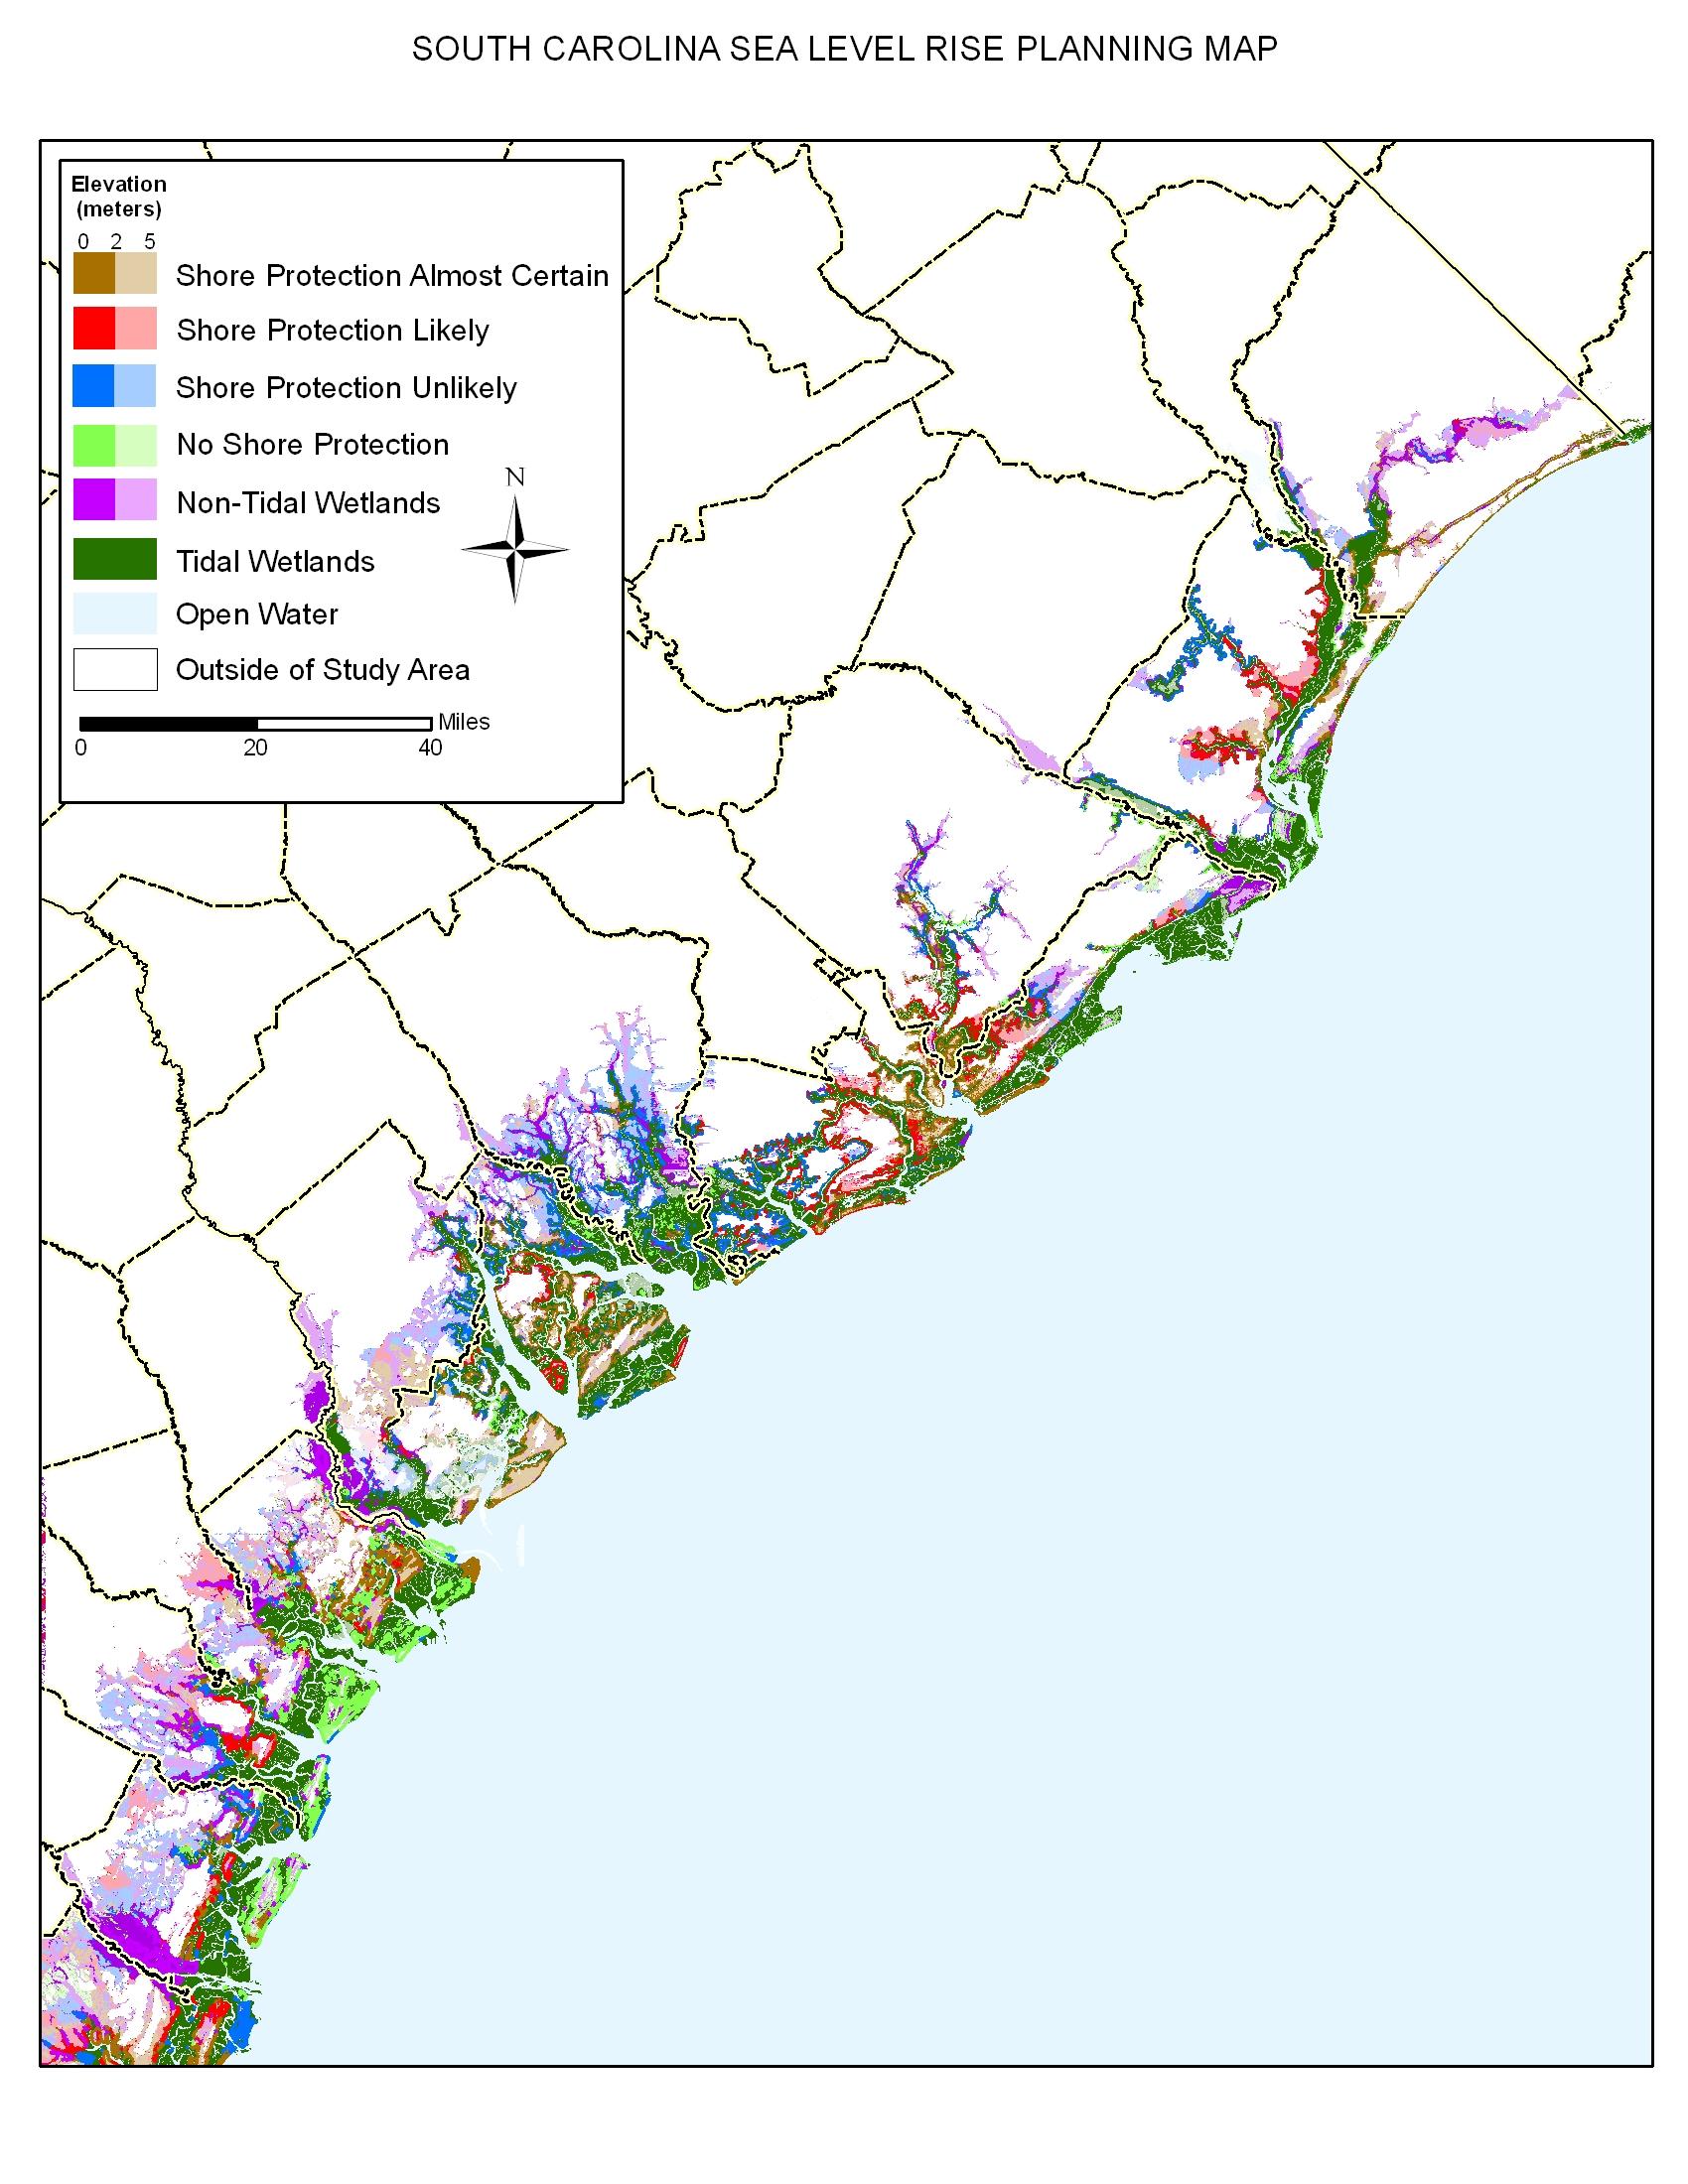 Coast Of South Carolina Map.Sea Level Rise Planning Maps Likelihood Of Shore Protection In